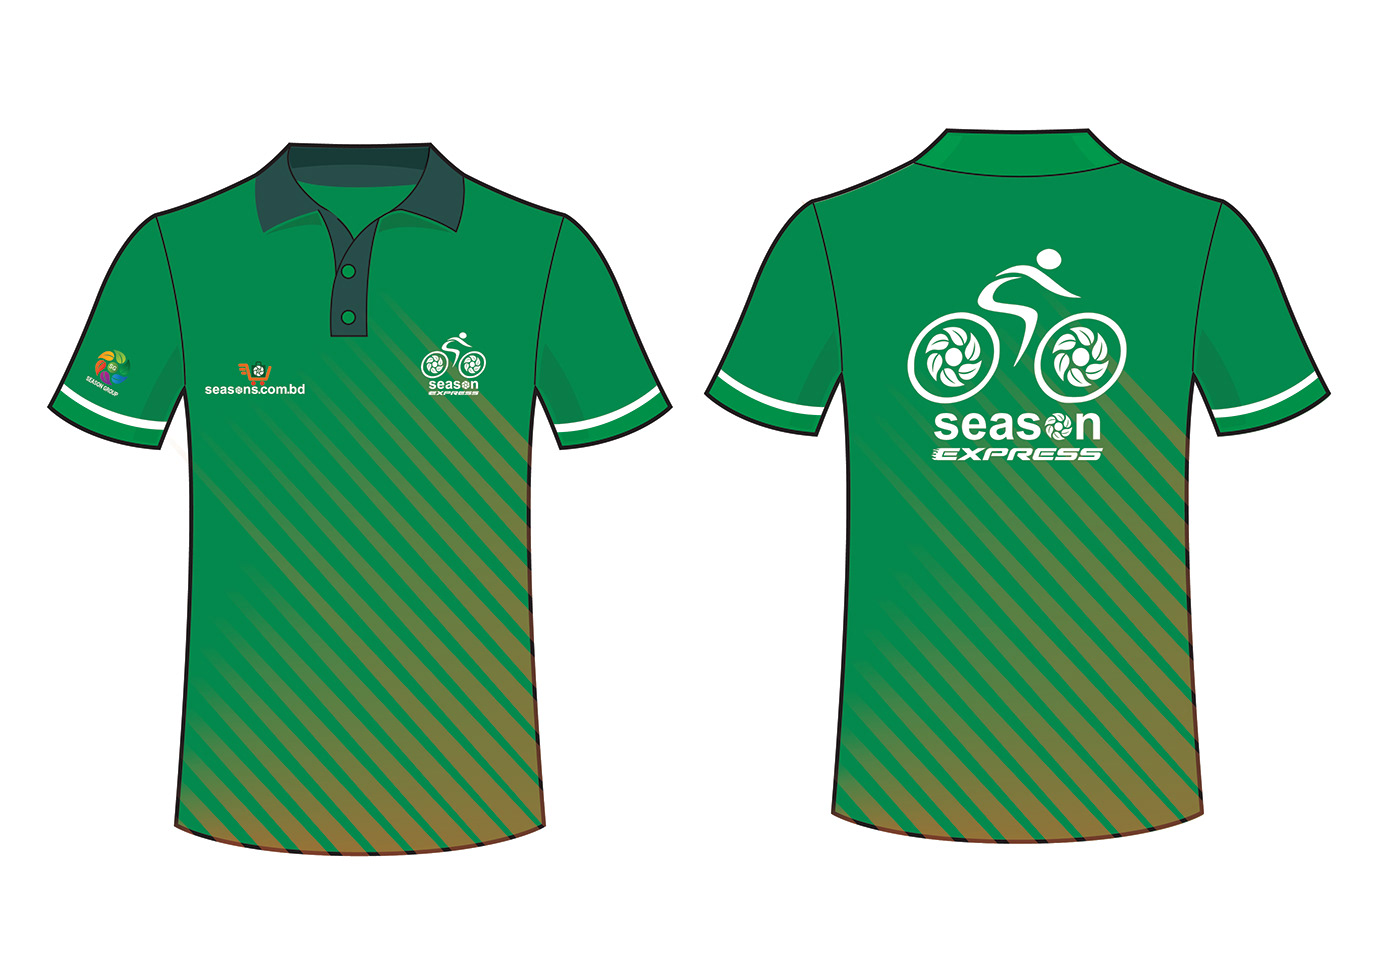 jersey Jersey Design jersey design cricket jersey design new Rezuanul islam roni roni update design soccer jersey design